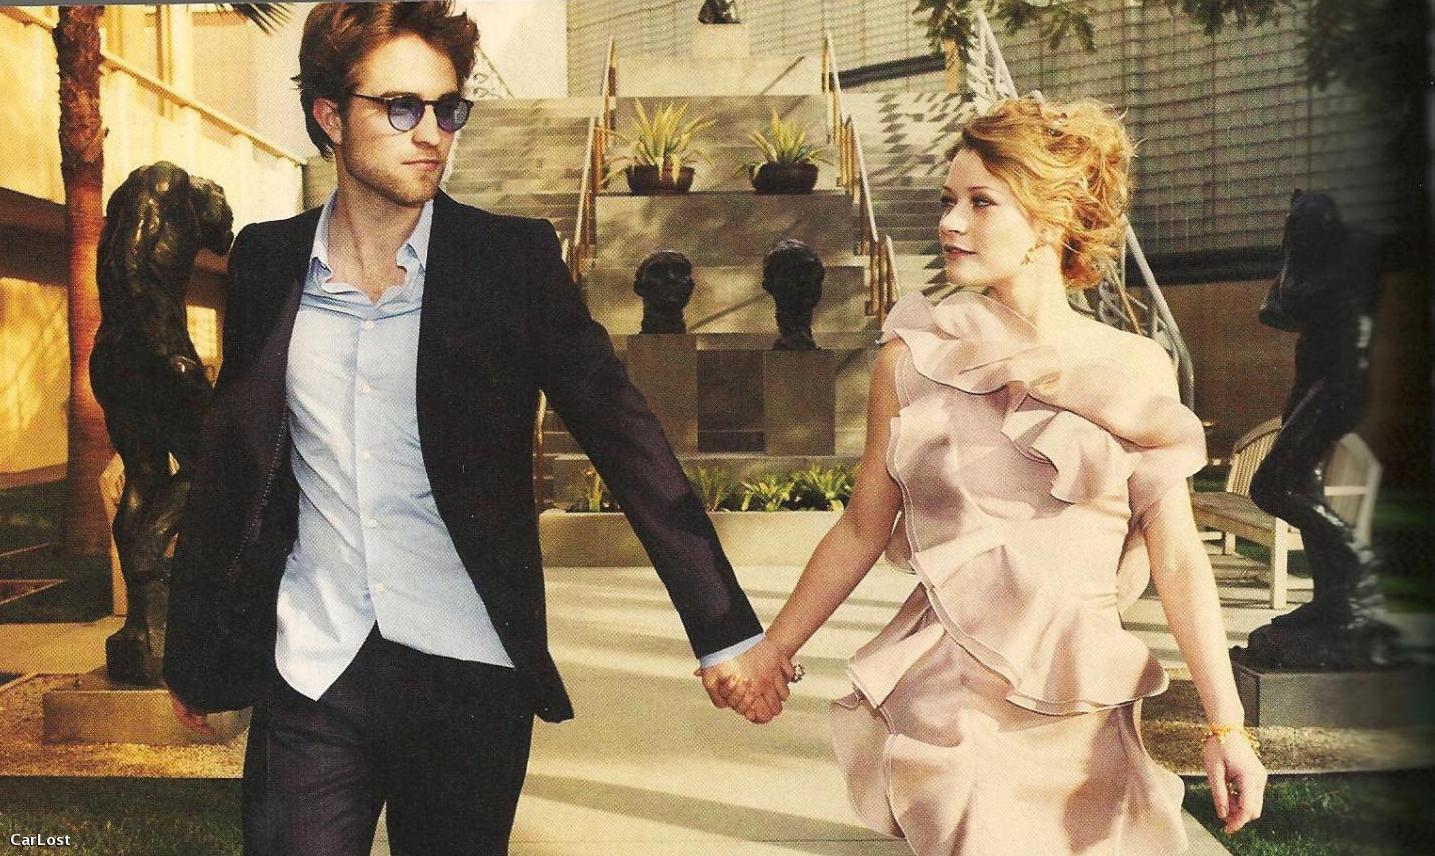 http://3.bp.blogspot.com/_oYUcAIcJpsI/TG1KiMennLI/AAAAAAAAB74/L4FKZGRHWsk/s1600/Emilie_De_Ravin_Robert_Pattinson_Vogue_Photoshoot_CarLost_HQ_.jpg